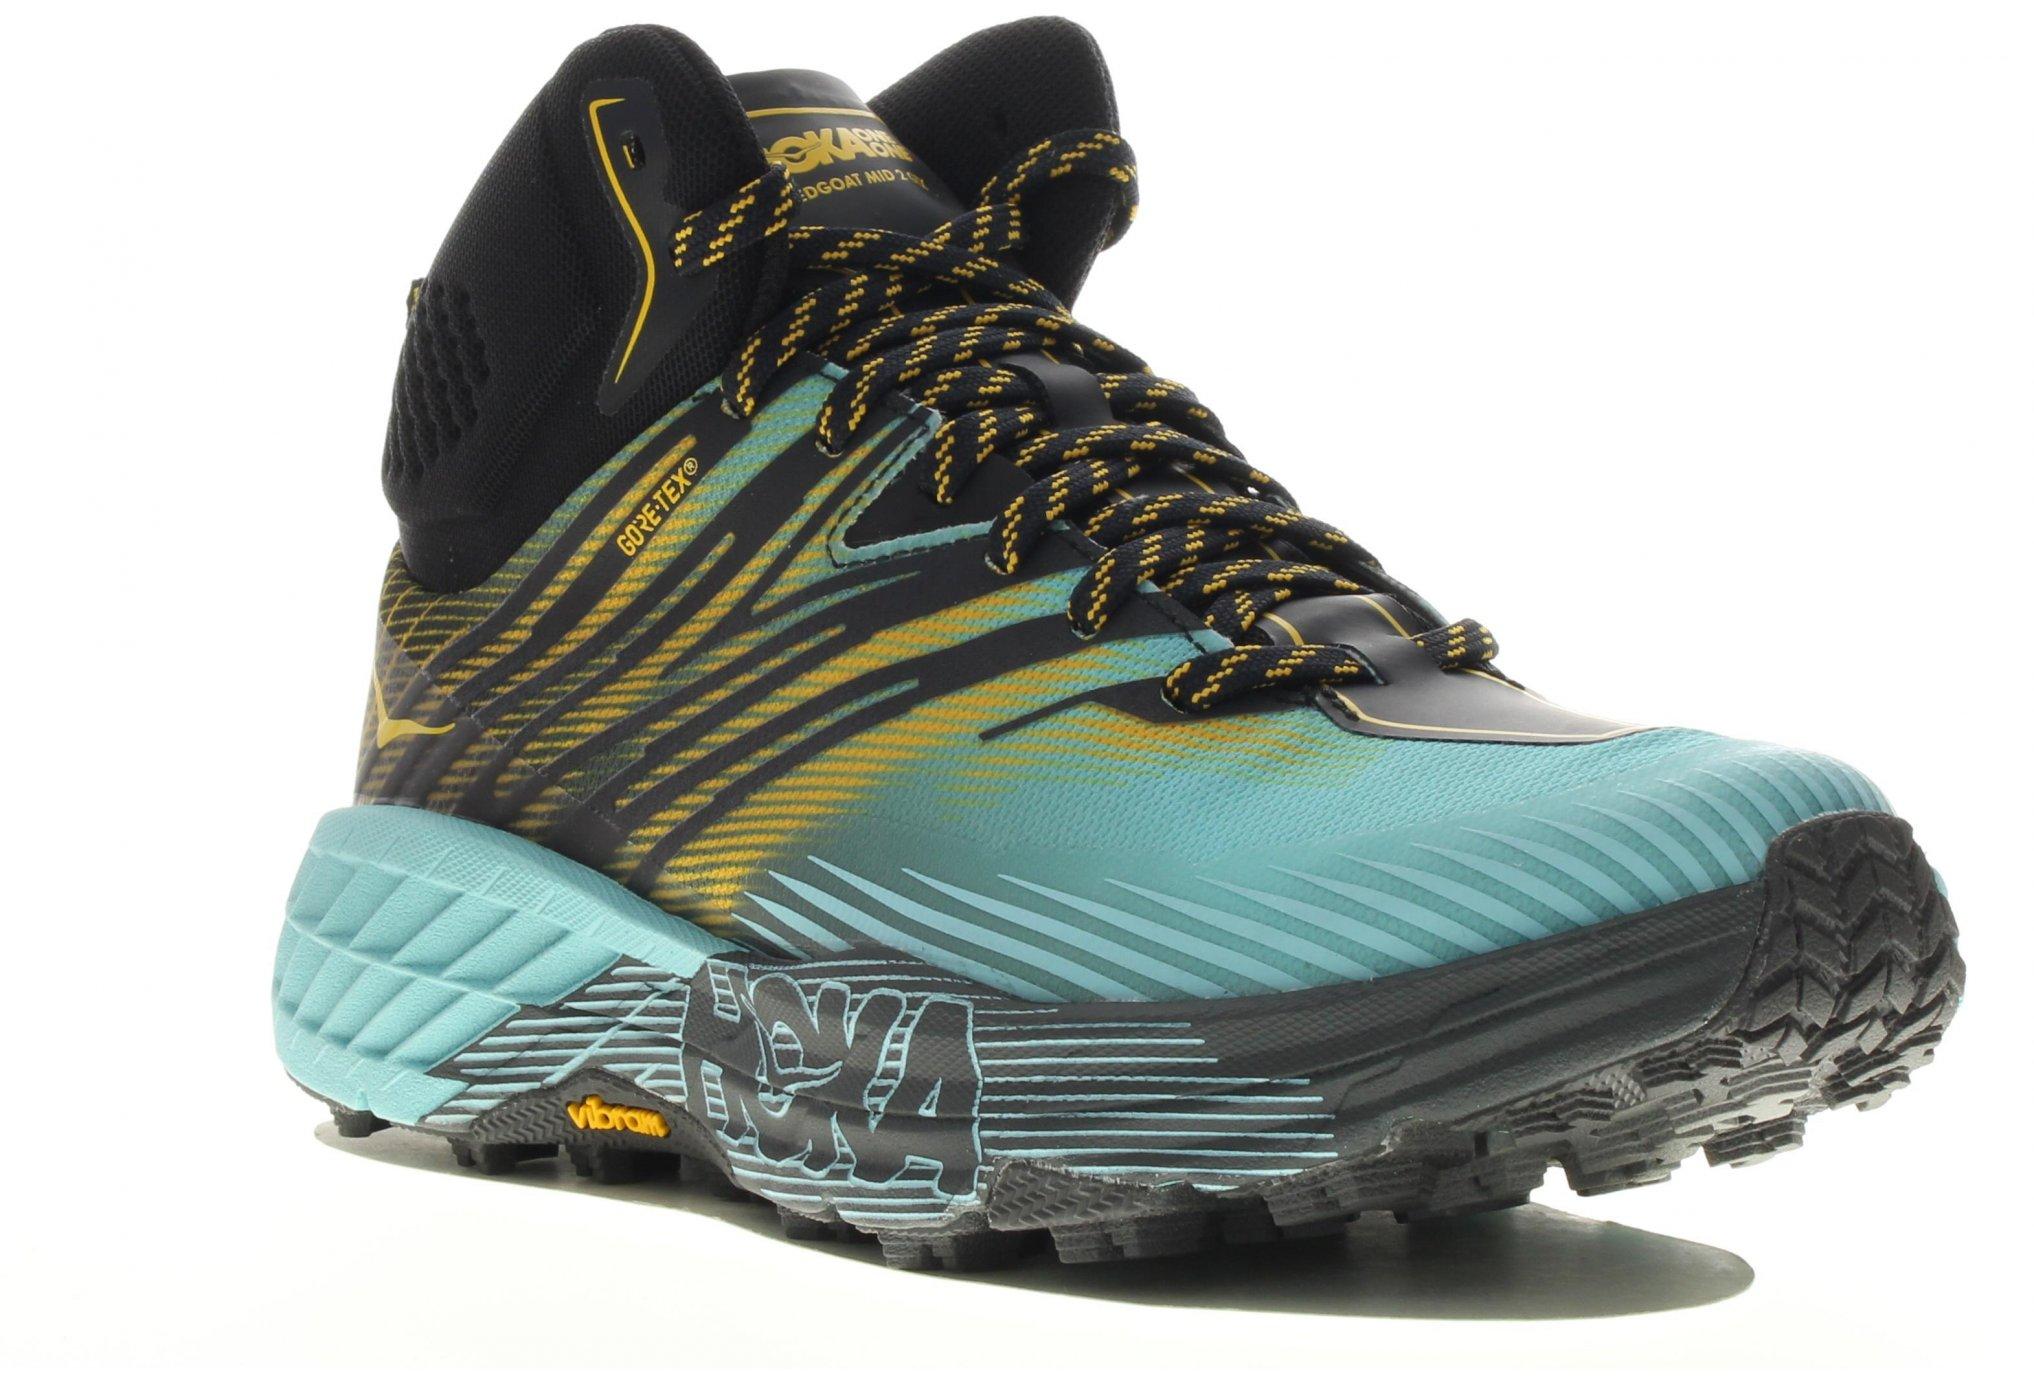 Hoka One One SpeedGoat Mid 2 Gore-Tex Chaussures running femme